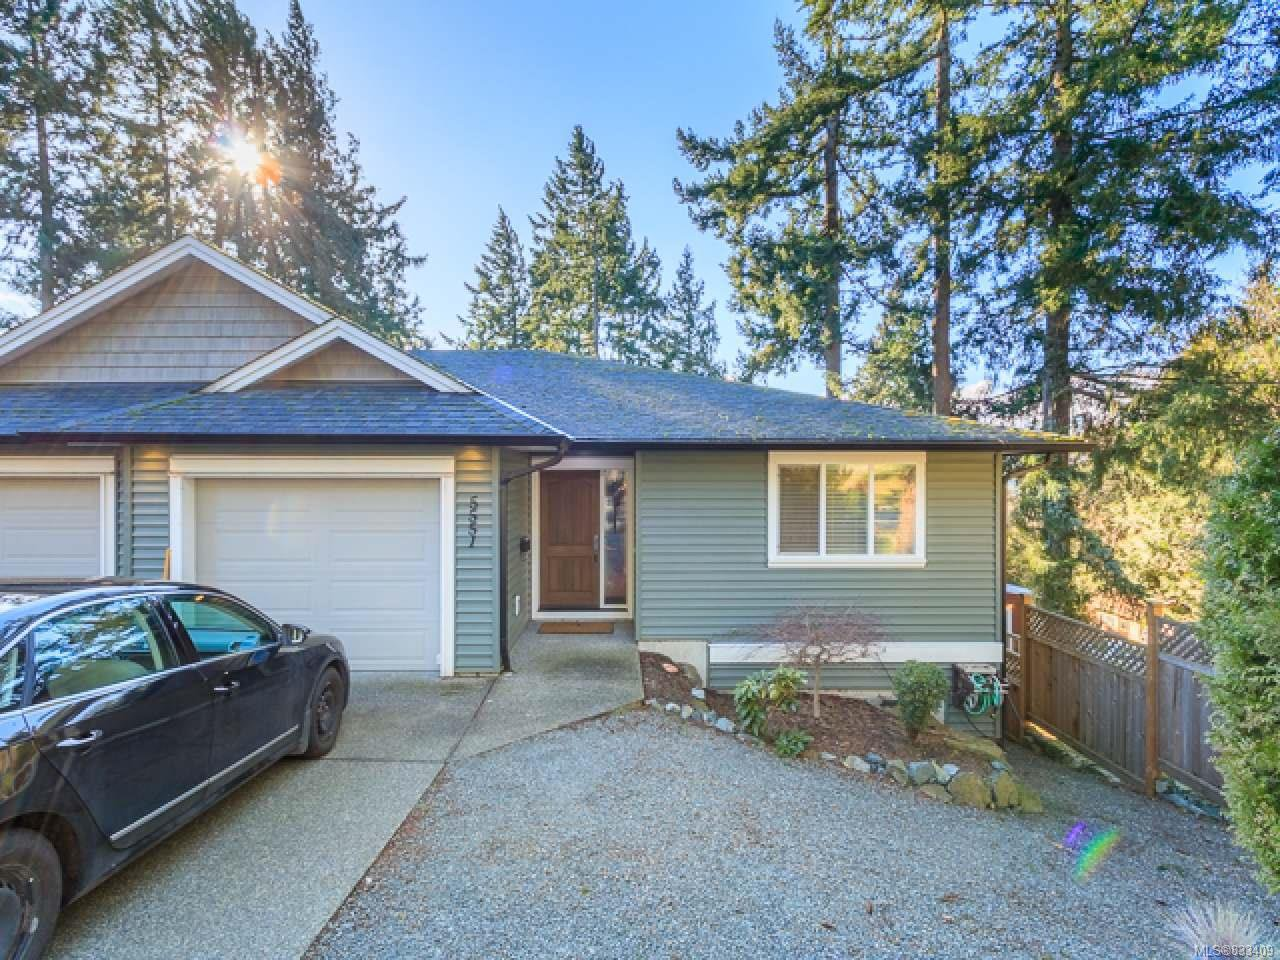 Main Photo: 5551 Big Bear Ridge in NANAIMO: Na Pleasant Valley Half Duplex for sale (Nanaimo)  : MLS®# 833409